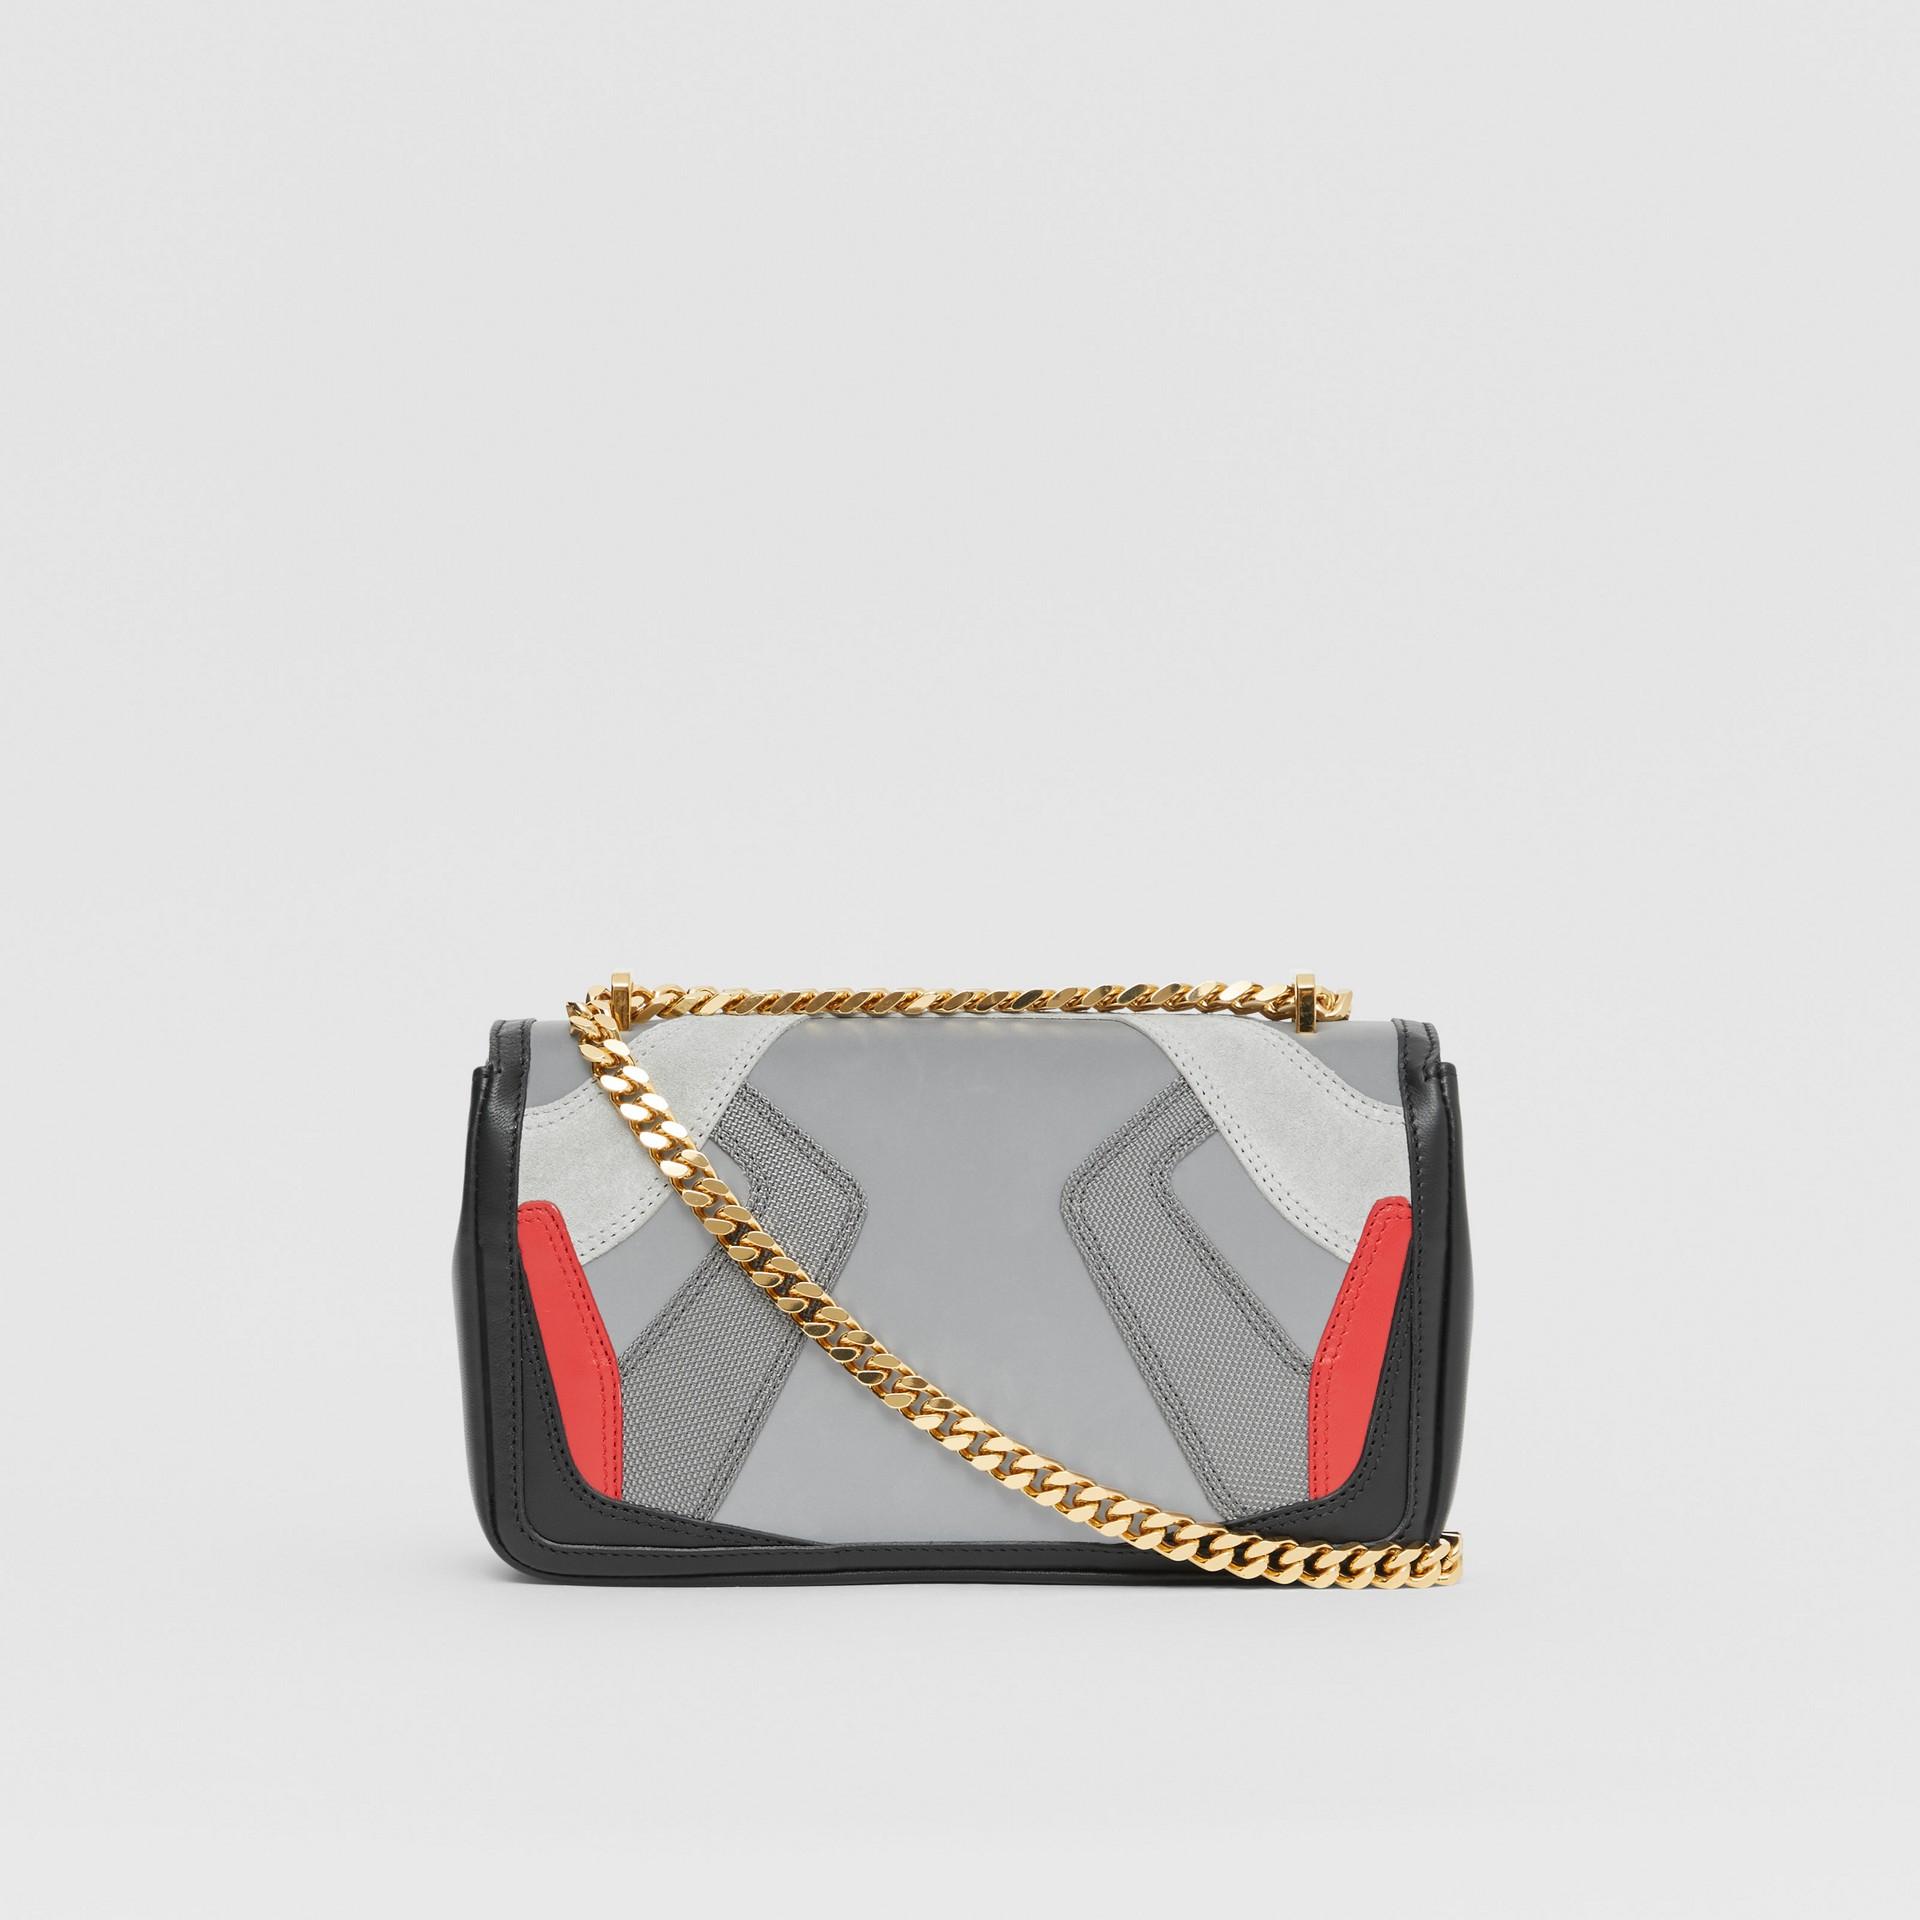 Small Appliqué Leather Lola Bag in Multicolour - Women | Burberry United Kingdom - gallery image 5